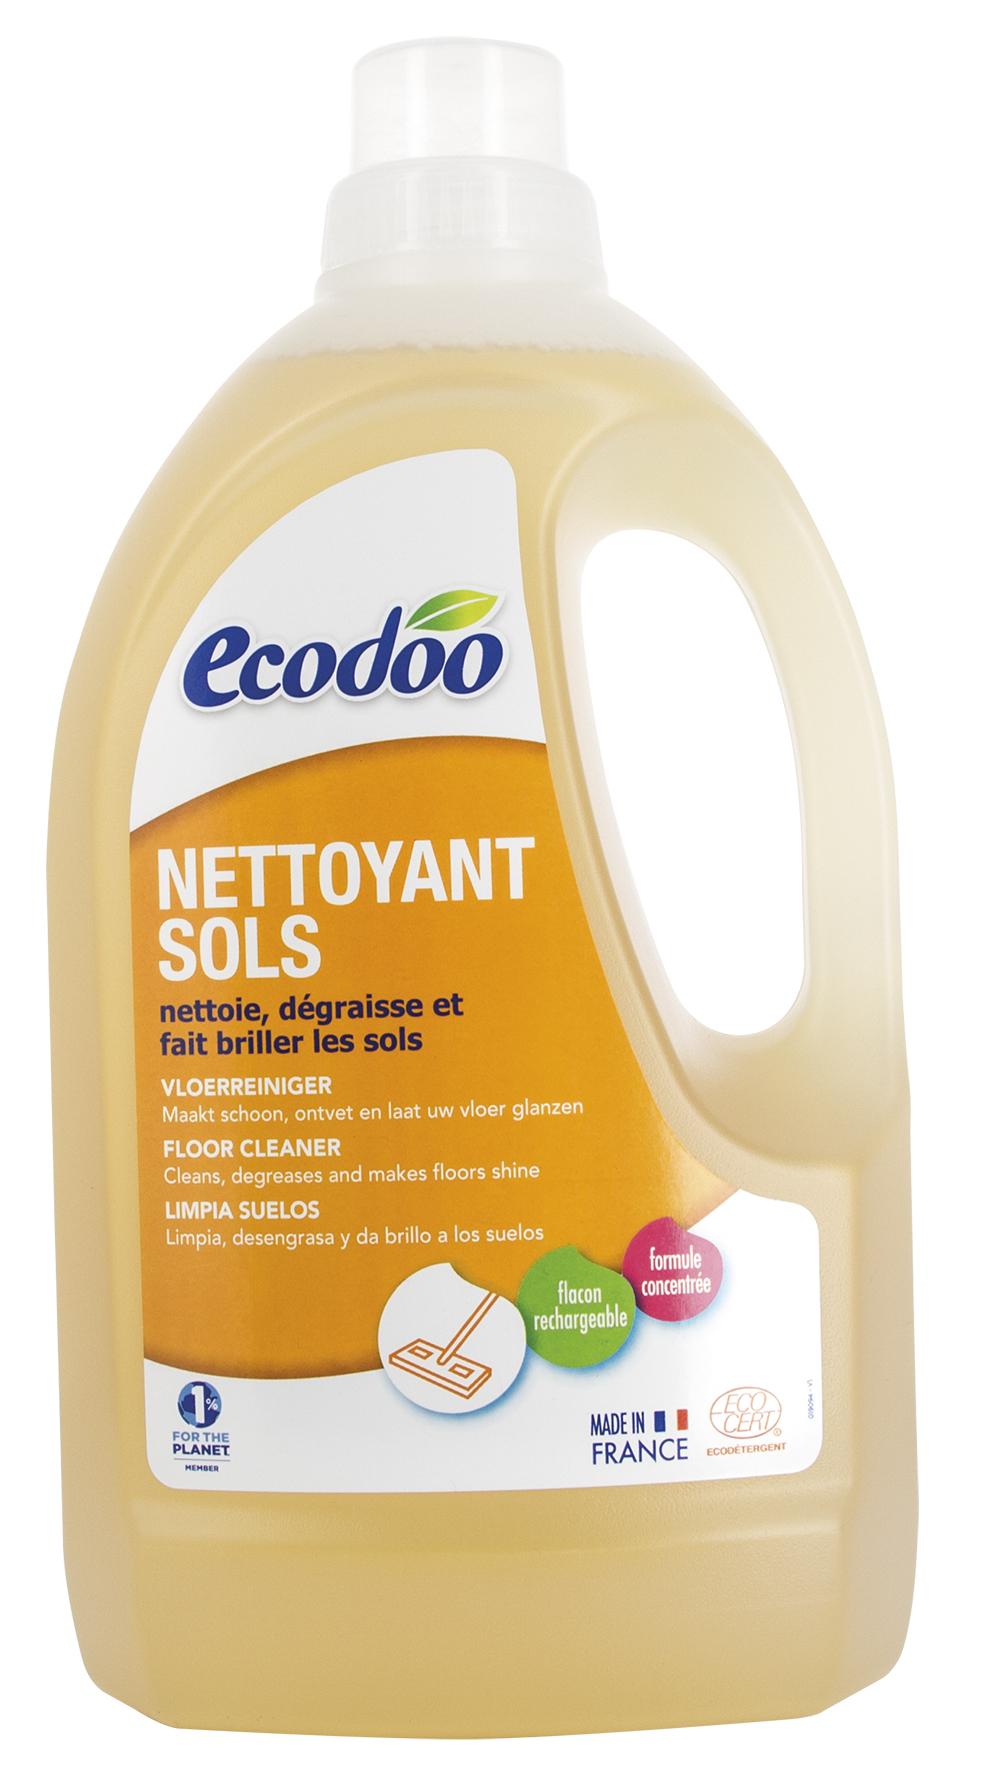 Nettoyant sols, Ecodoo (1.5 l)